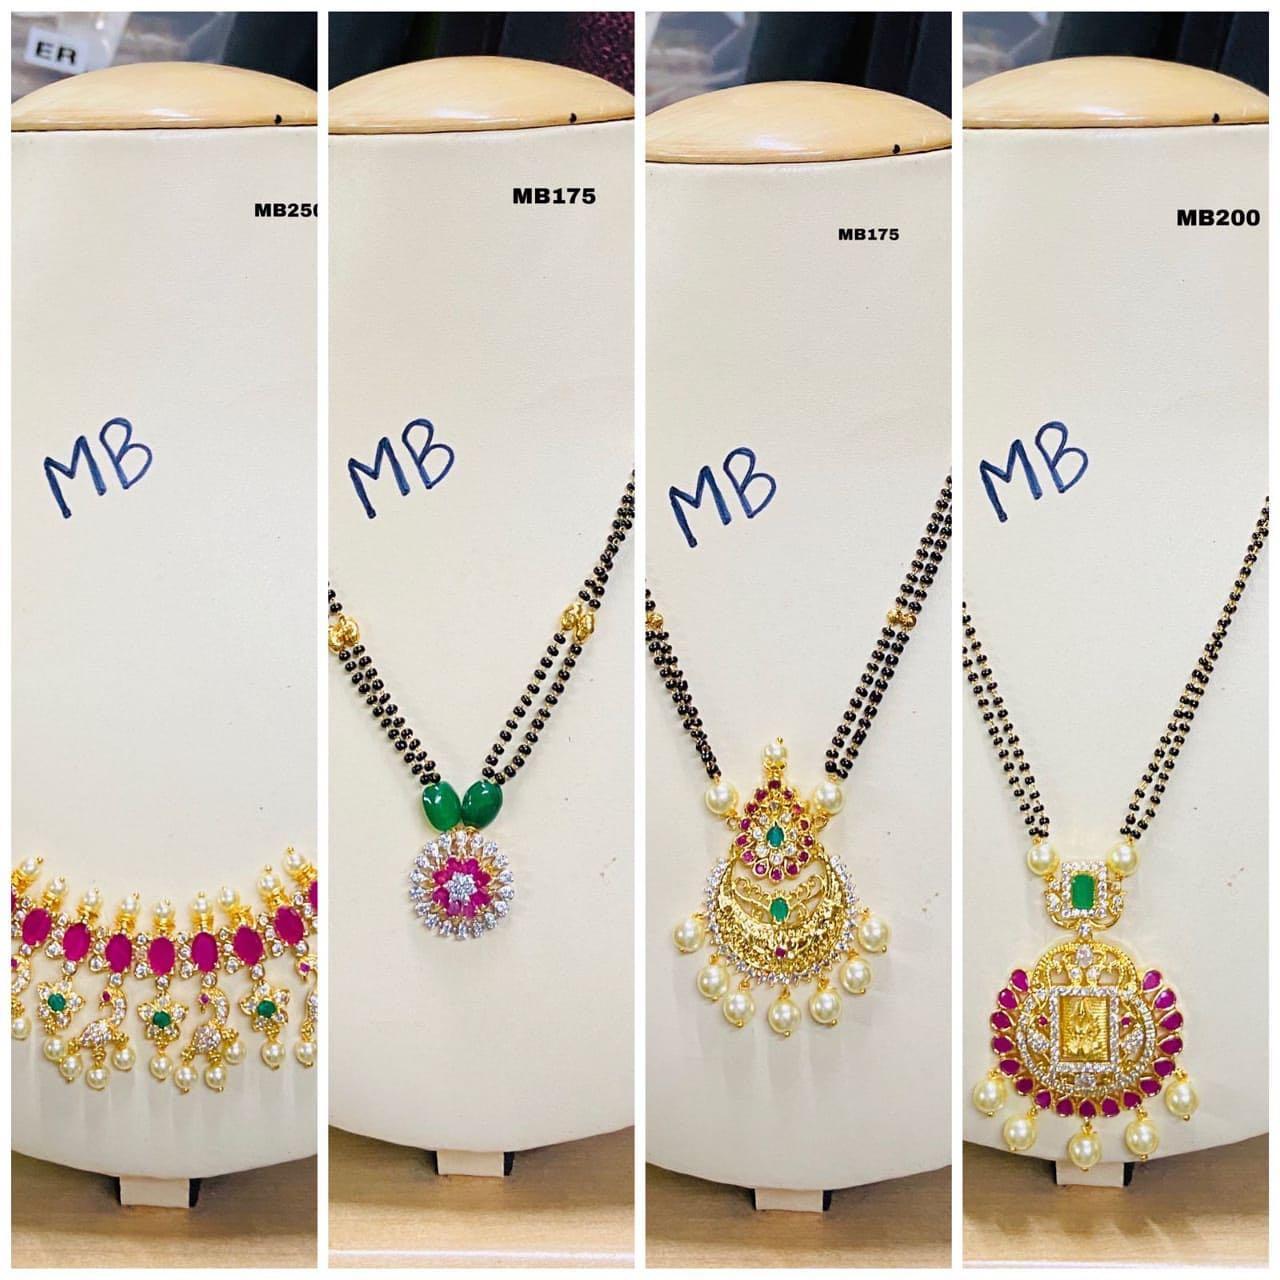 Beautiful one gram gold balck bead chain with cz studded pendant. 1 gram gold jewellery designs 1gm jewellery one gram gold thali chain